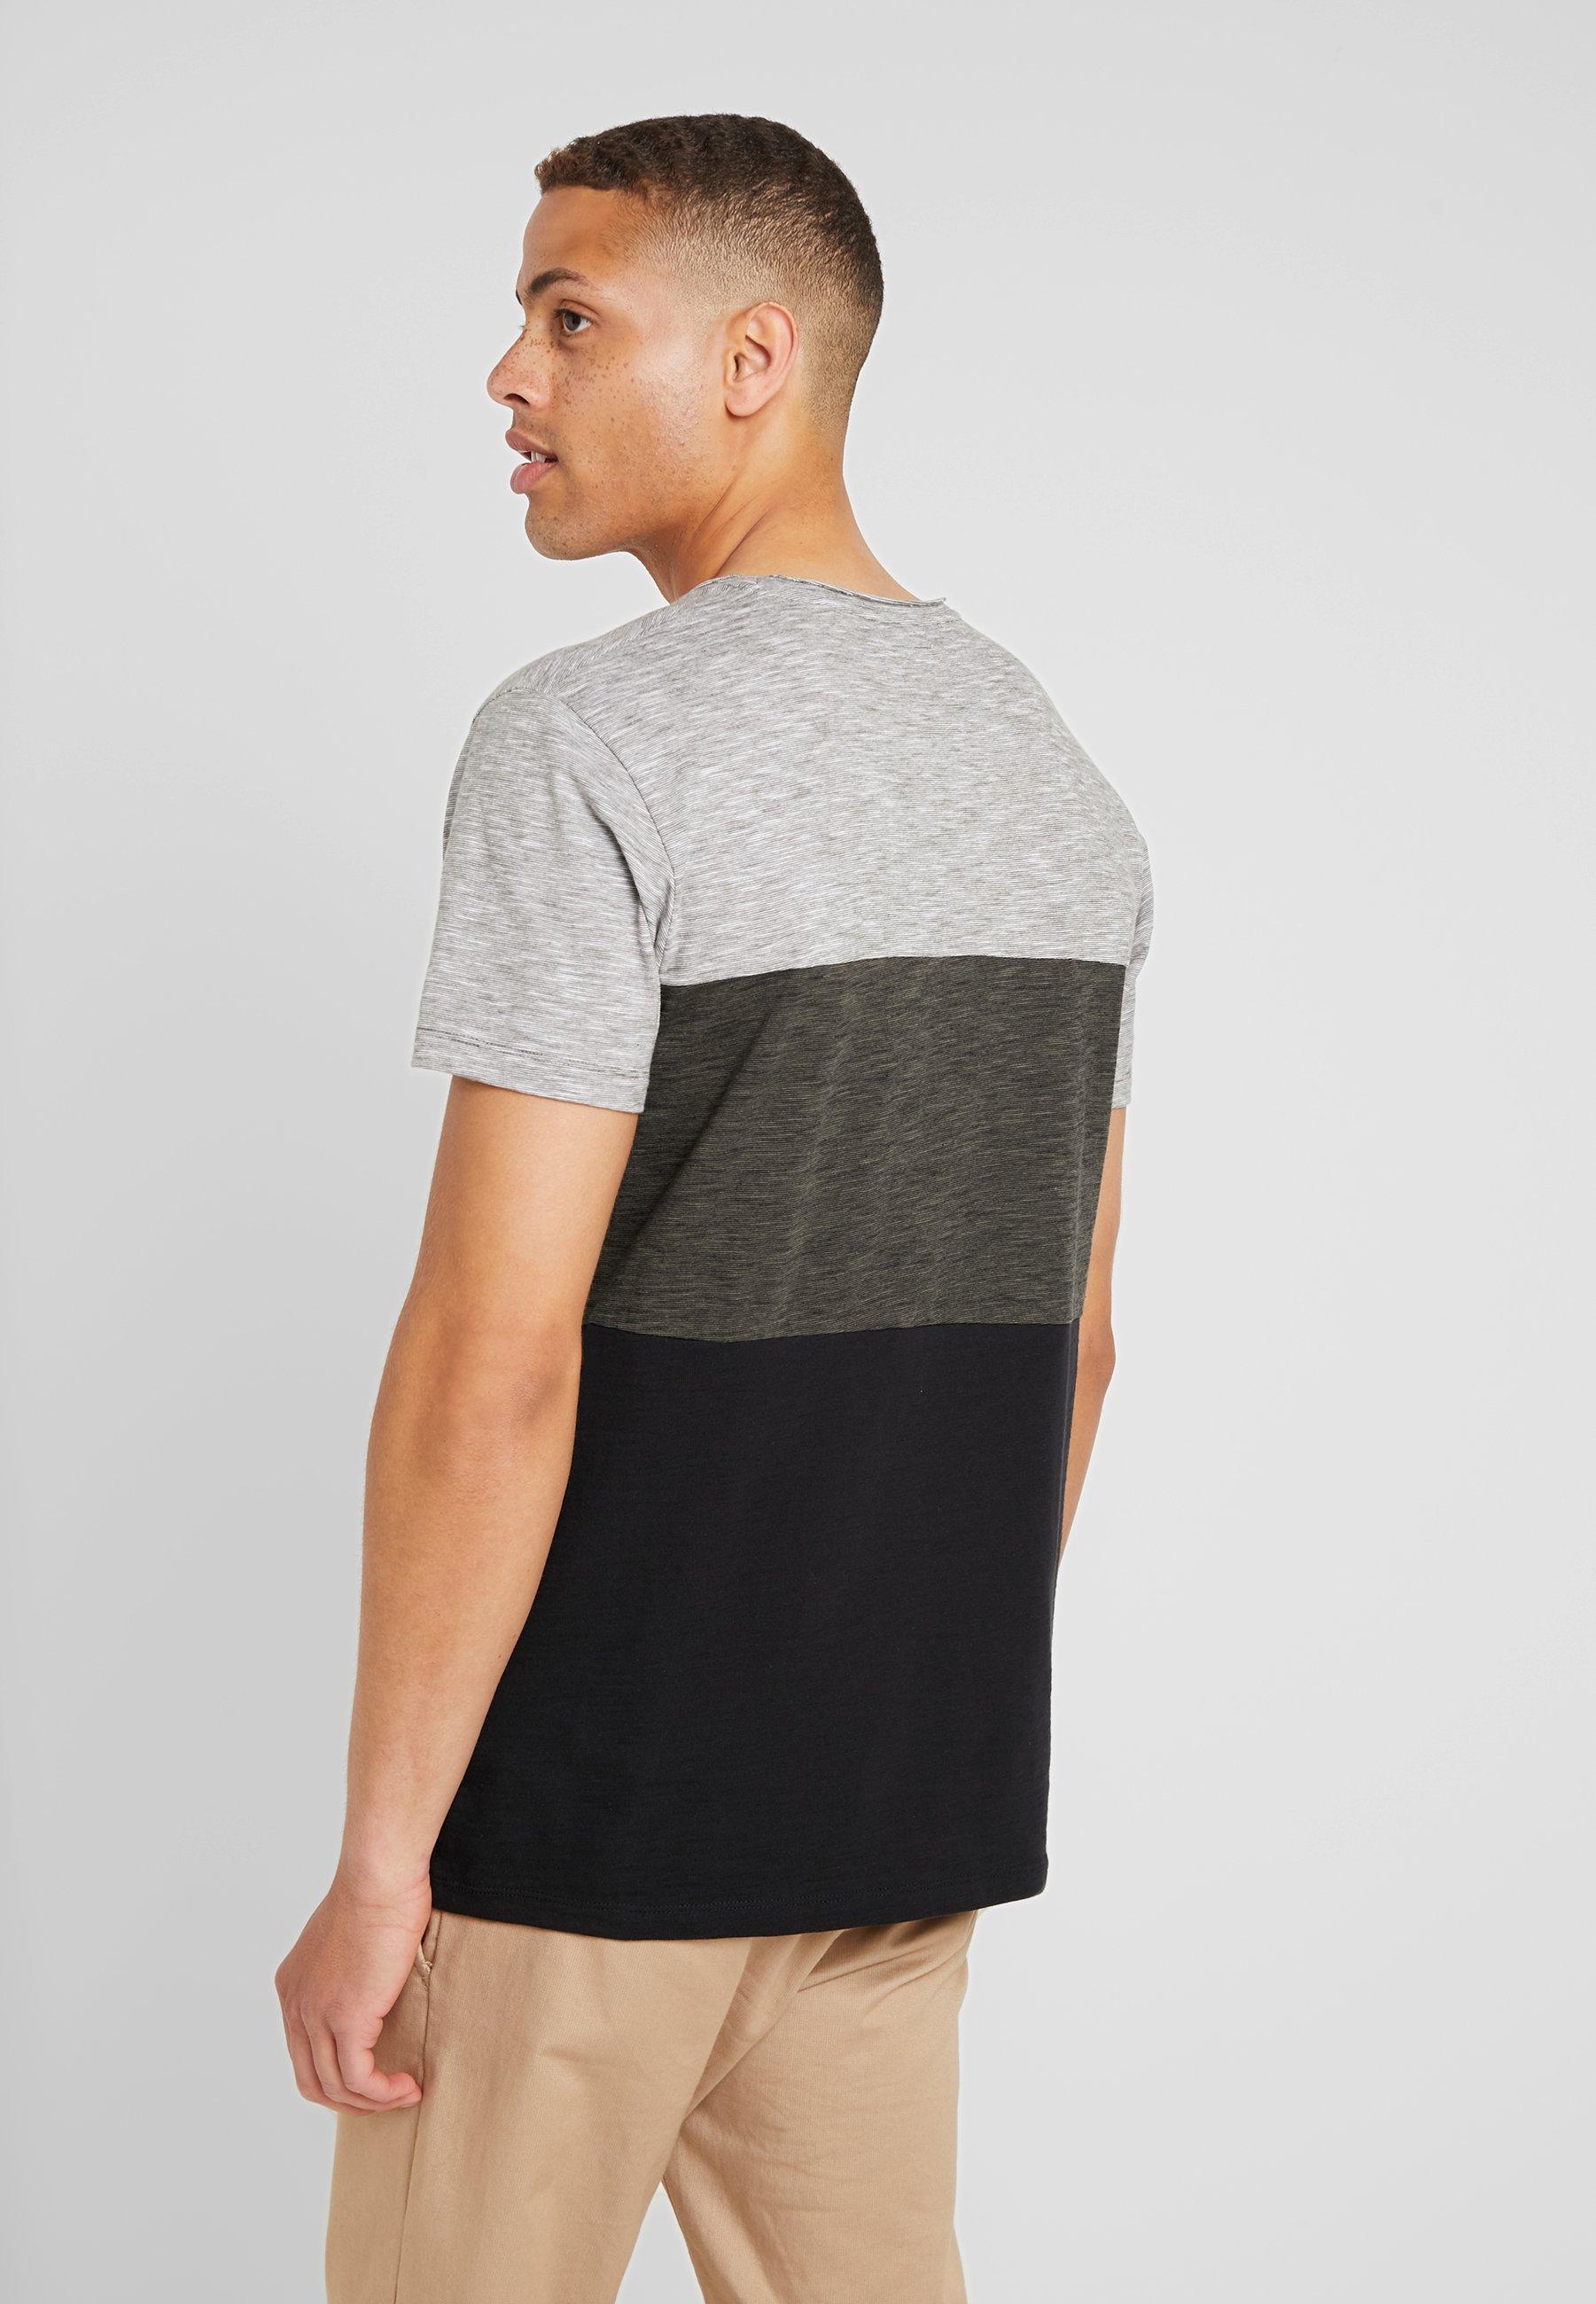 Color shirt Khaki Dark Esprit Block TeeT Edc By Imprimé wNvnm8O0